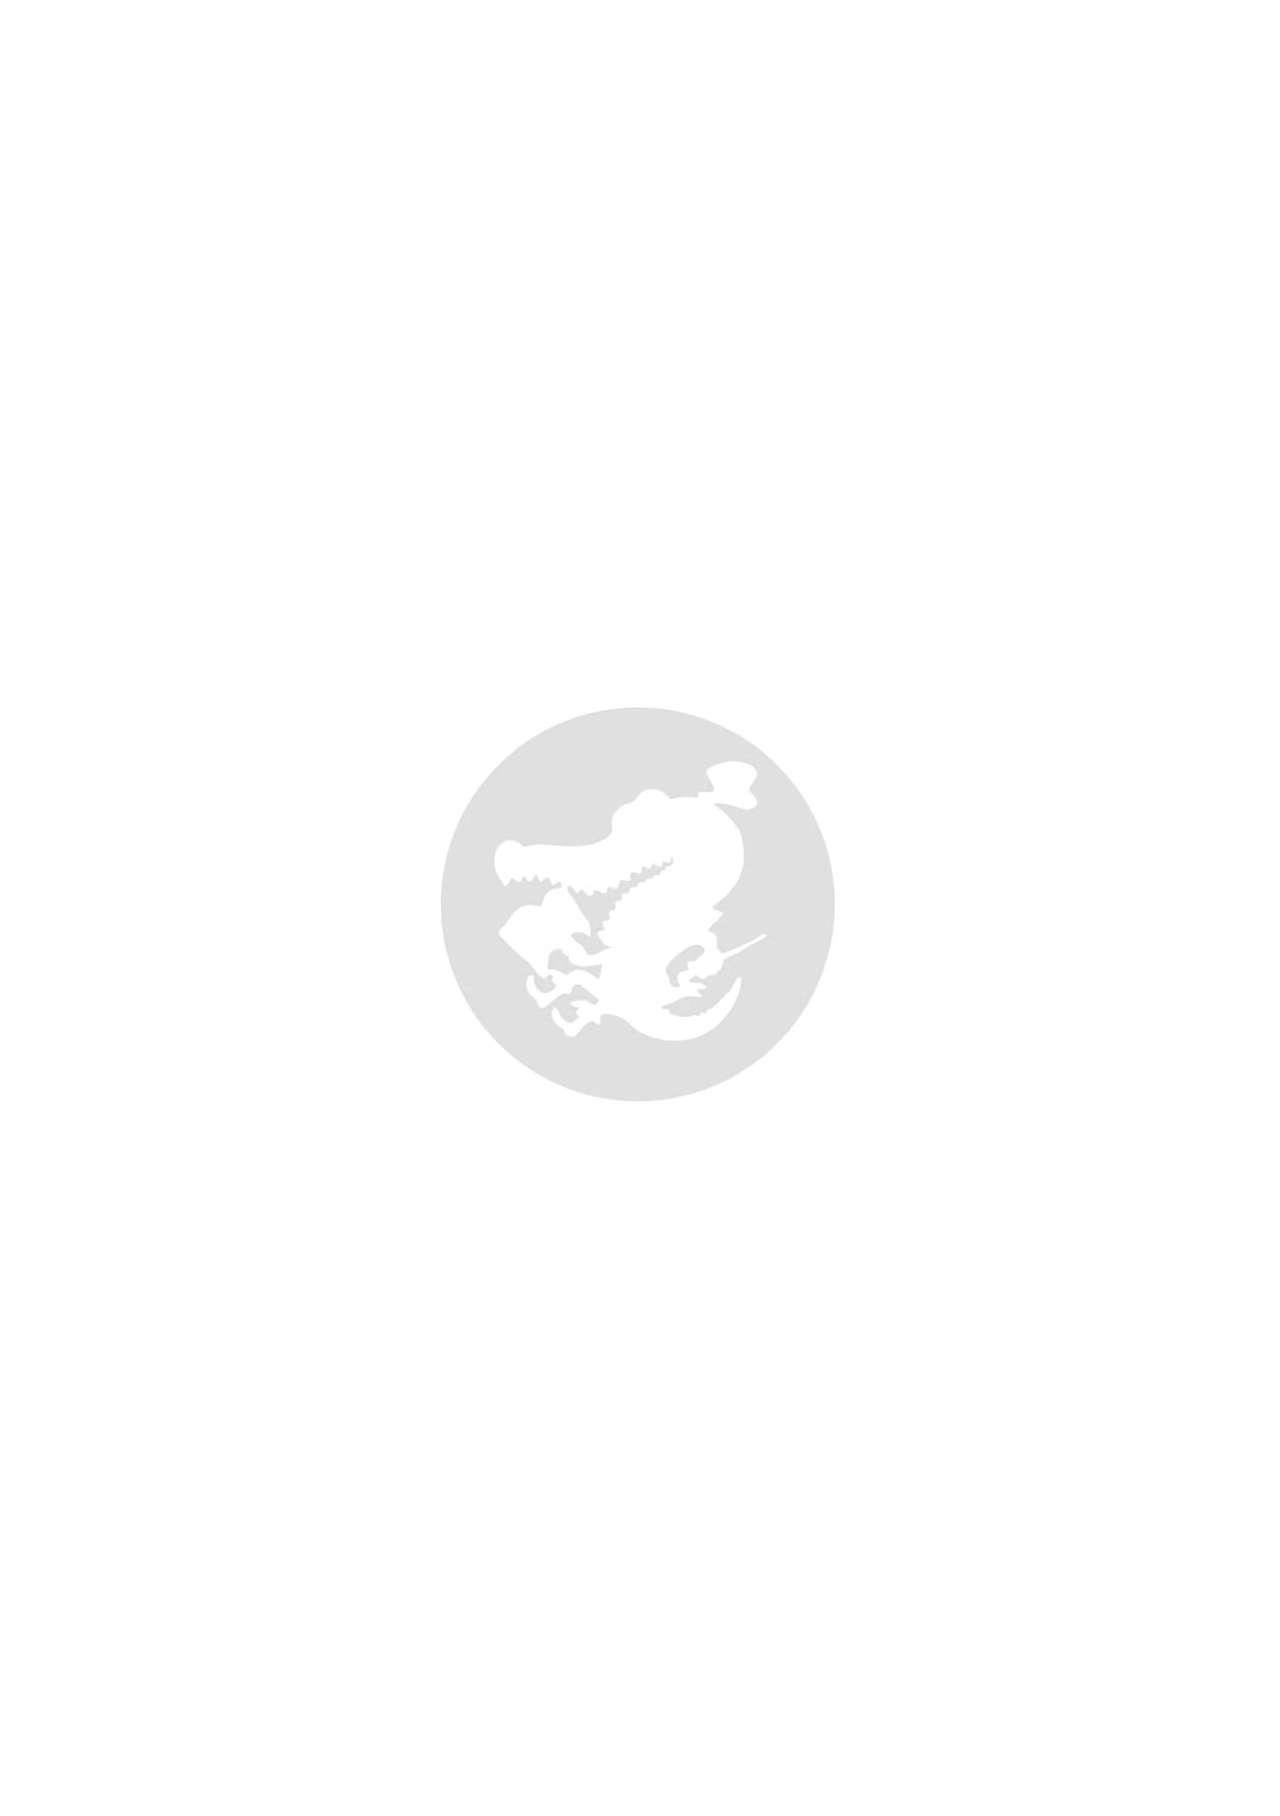 [Saemon] Ironna Kankei - Iro-Ero relationship Ch. 1-2, 4, 6, 8, 10, 12 [English] [N04h] [Digital] 118